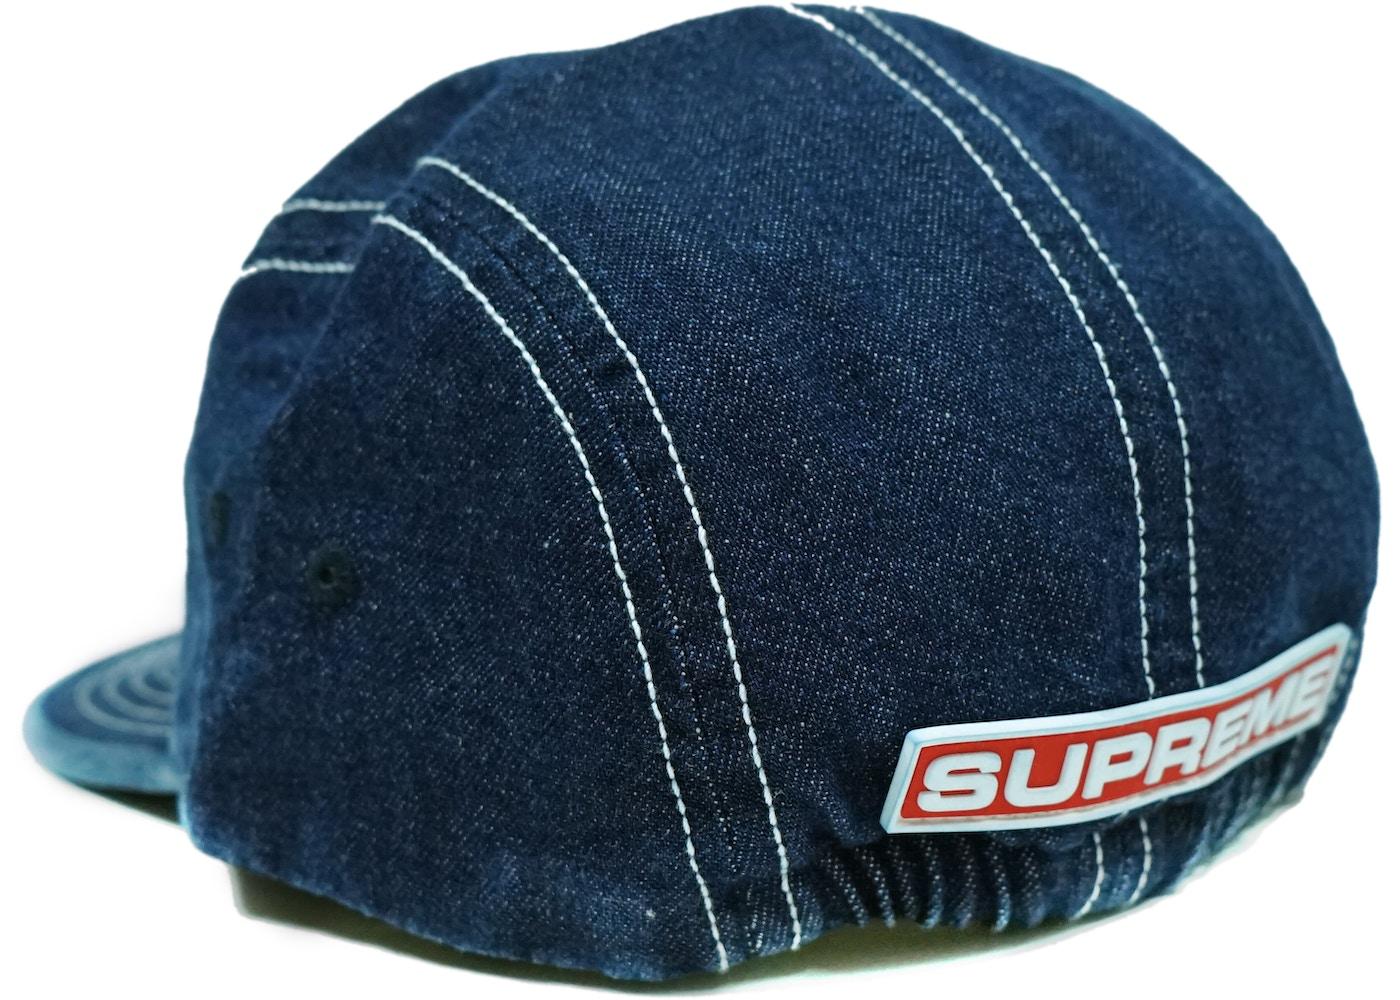 d6a446147cd Streetwear - Supreme Headwear - Volatility